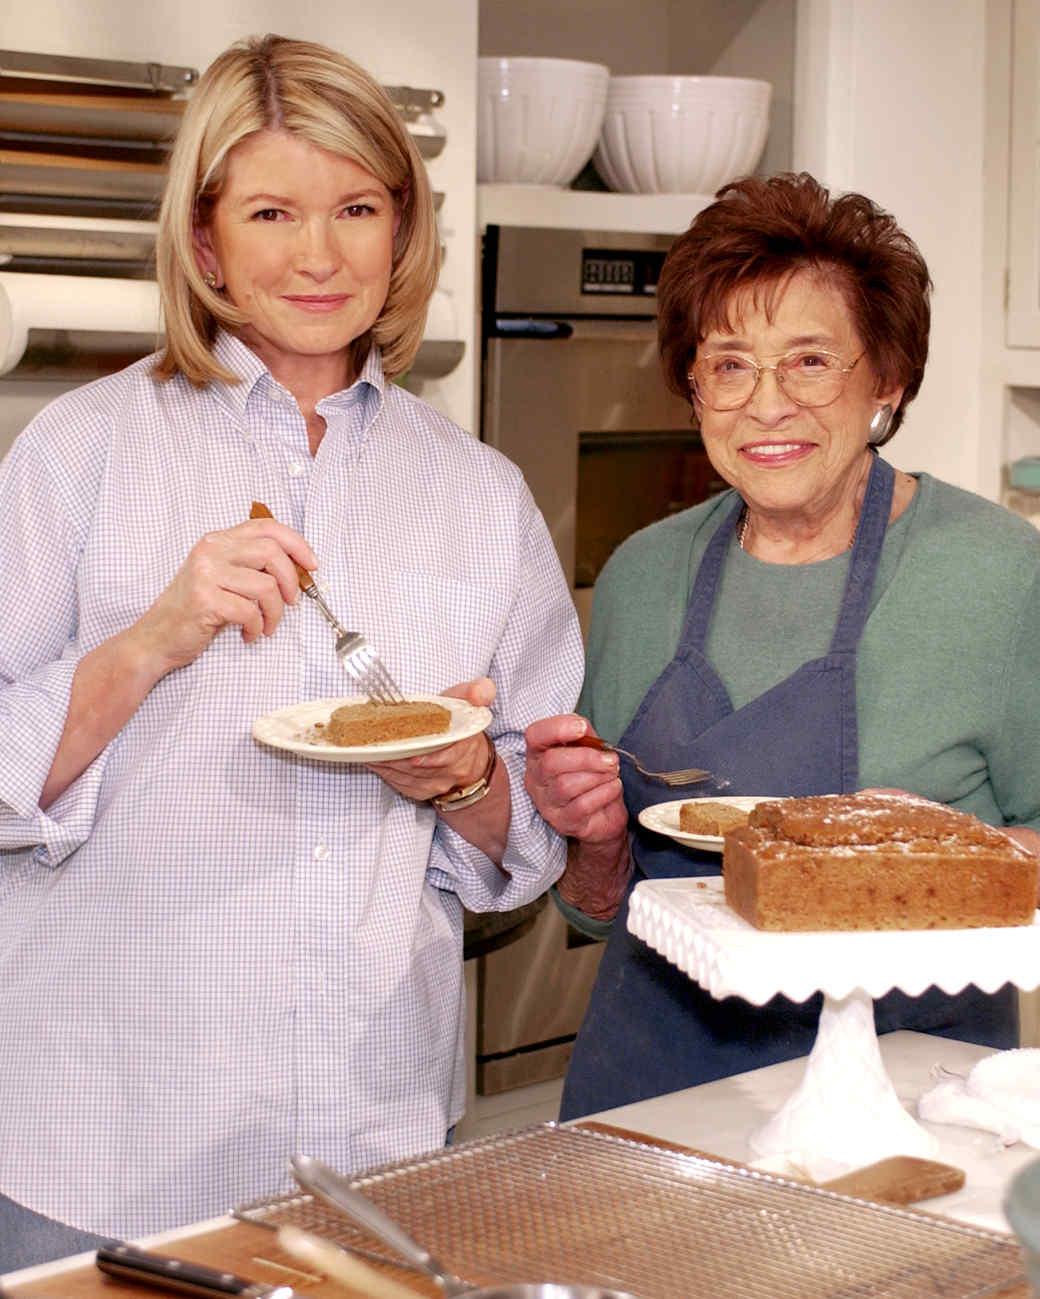 Mrs. Kostyra's Spice Cake